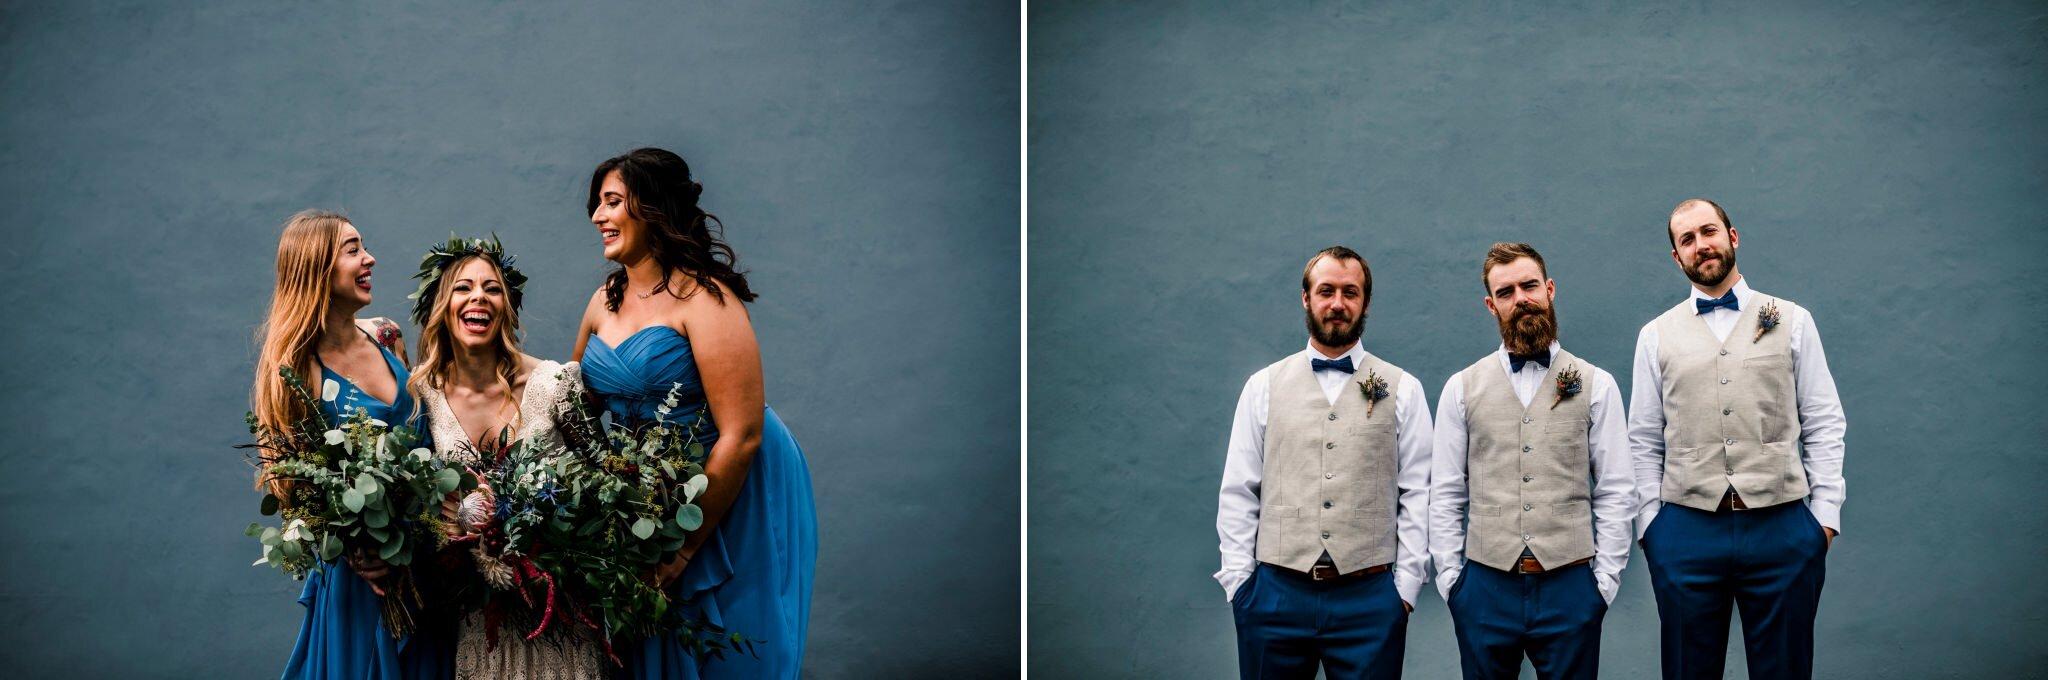 Hoffman-618-New-Jersey-Wedding-Photographer-60.JPG